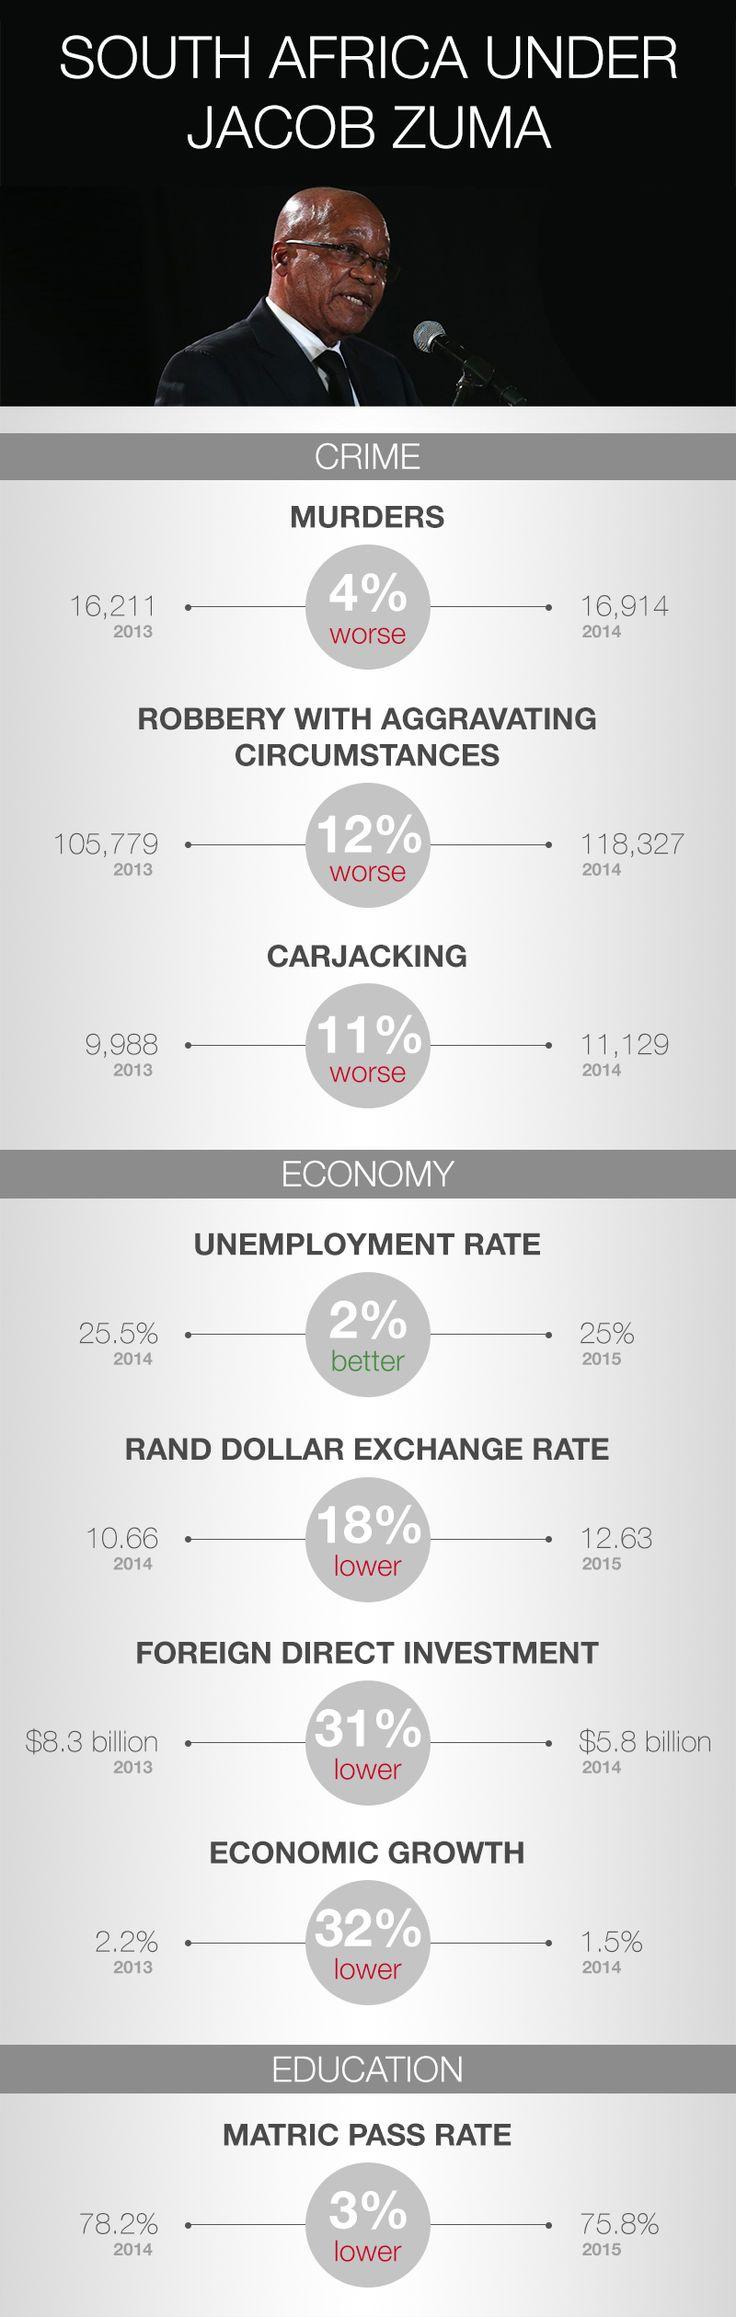 South Africa under Jacob Zuma